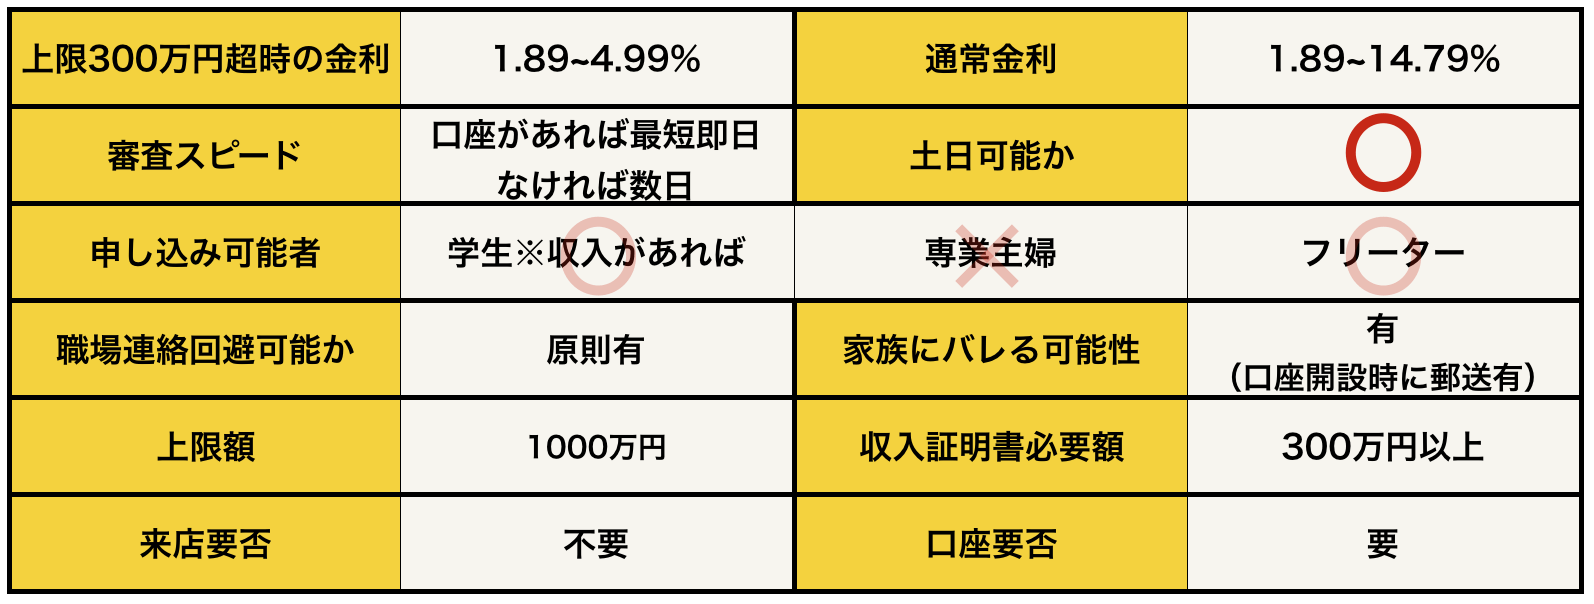 %e3%82%b9%e3%82%af%e3%83%aa%e3%83%bc%e3%83%b3%e3%82%b7%e3%83%a7%e3%83%83%e3%83%88-2016-10-24-20-44-13